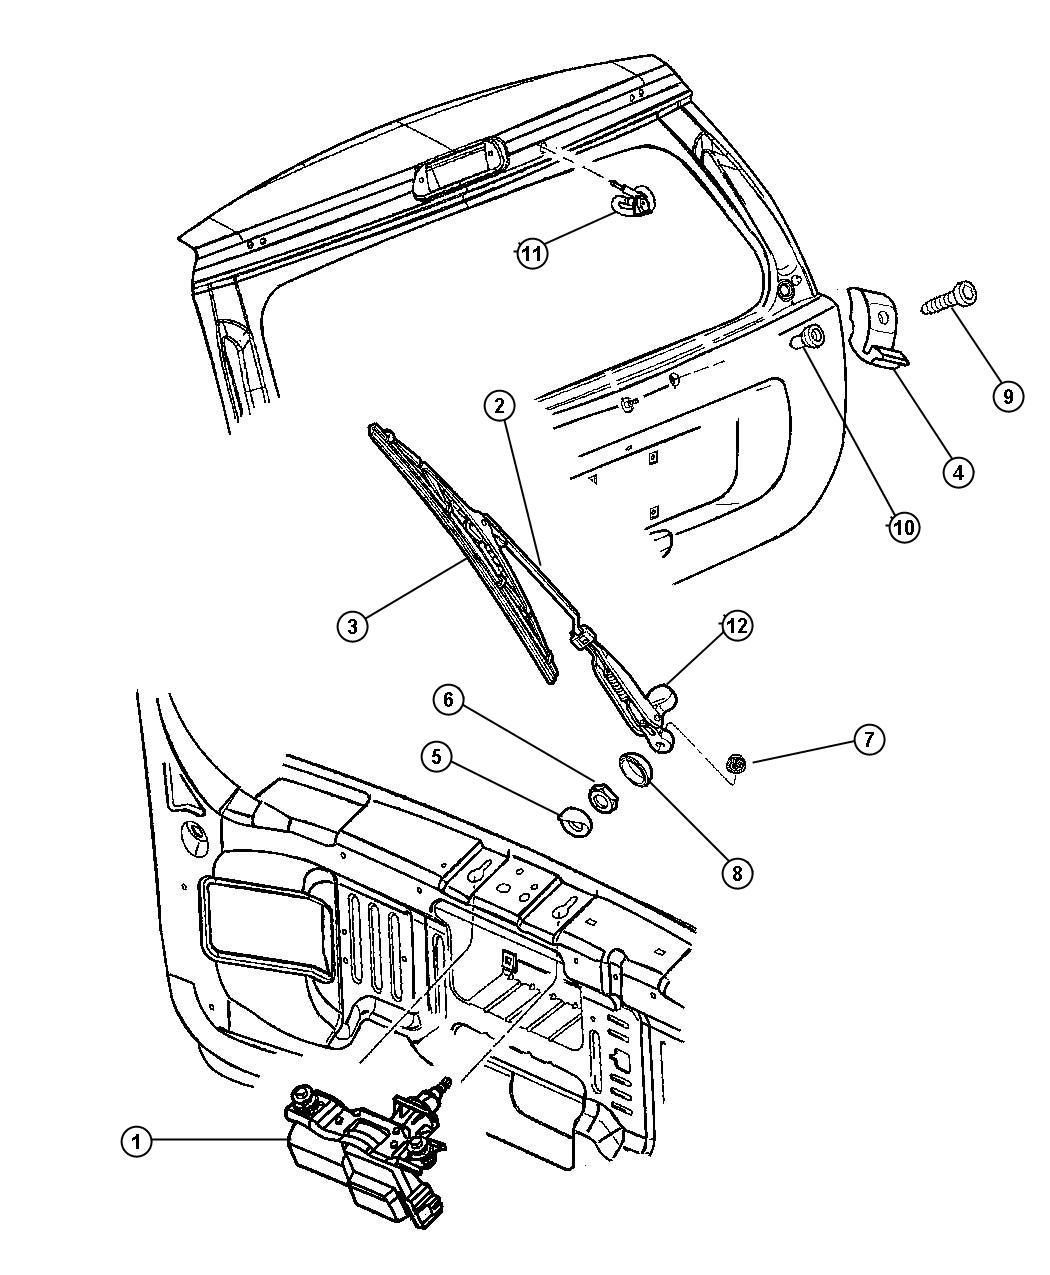 Jeep Liberty Cap, cover. Rear wiper arm, rear wiper motor